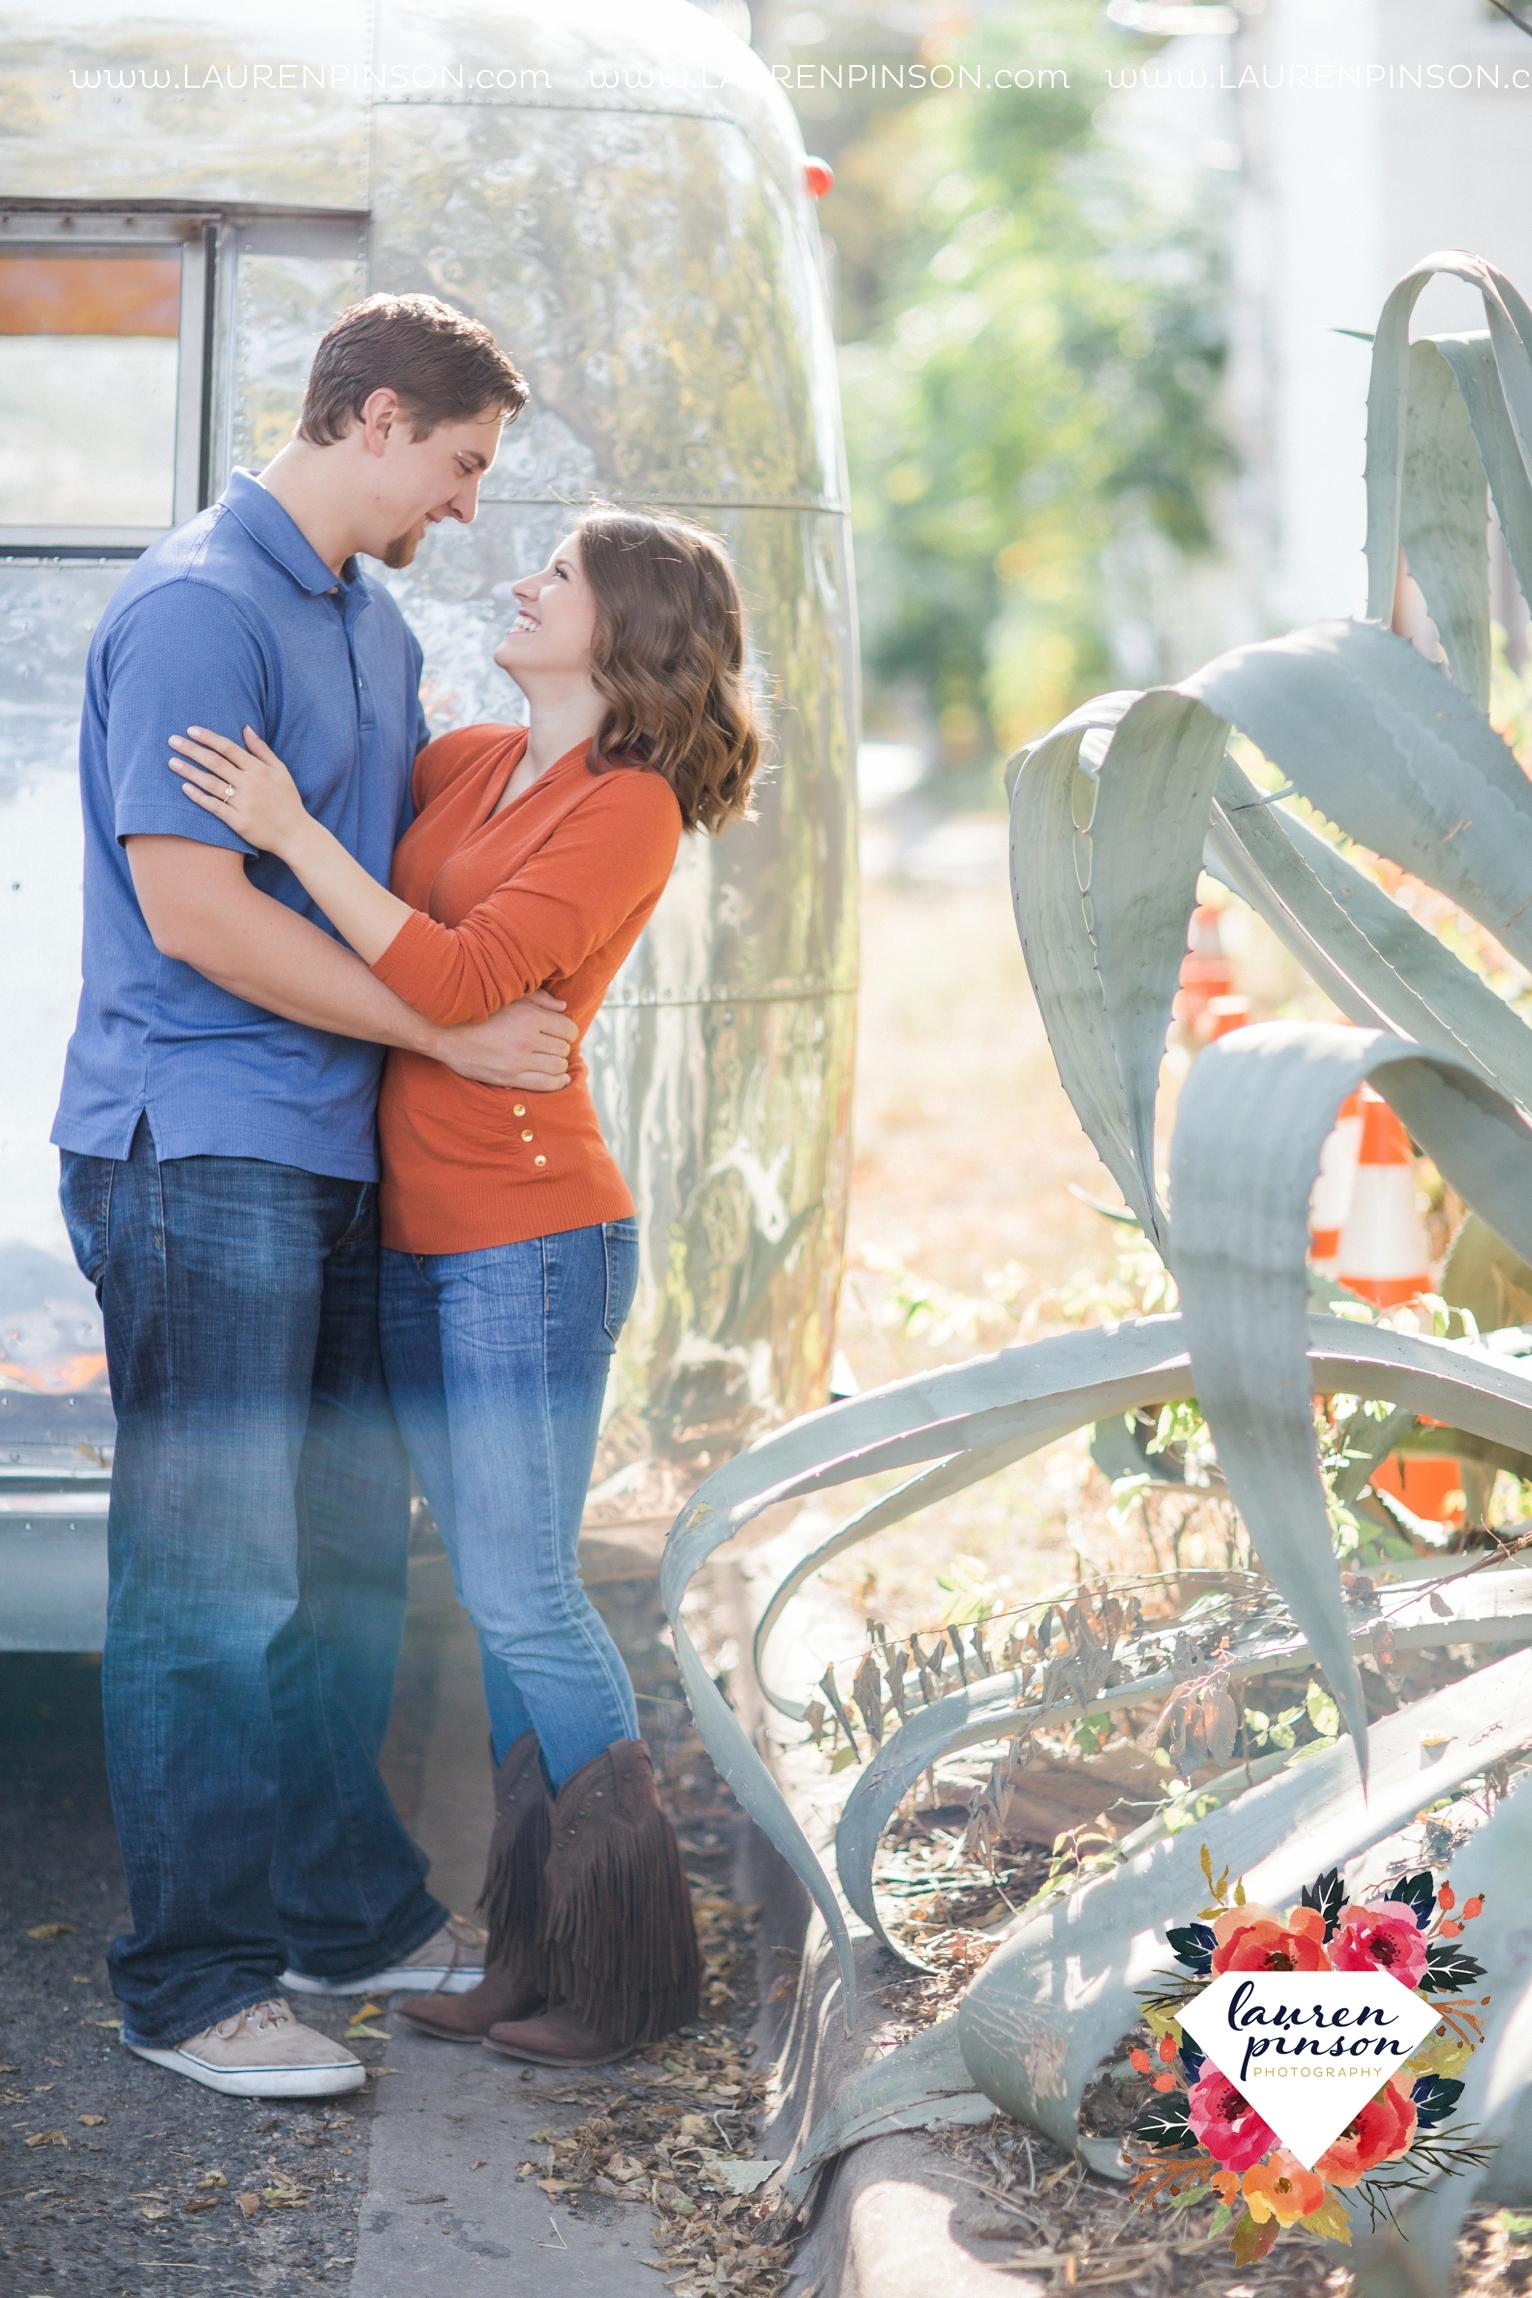 austin-texas-engagement-session-photography-by-wichita-falls-wedding-photgraphy-lauren-pinson_1377.jpg